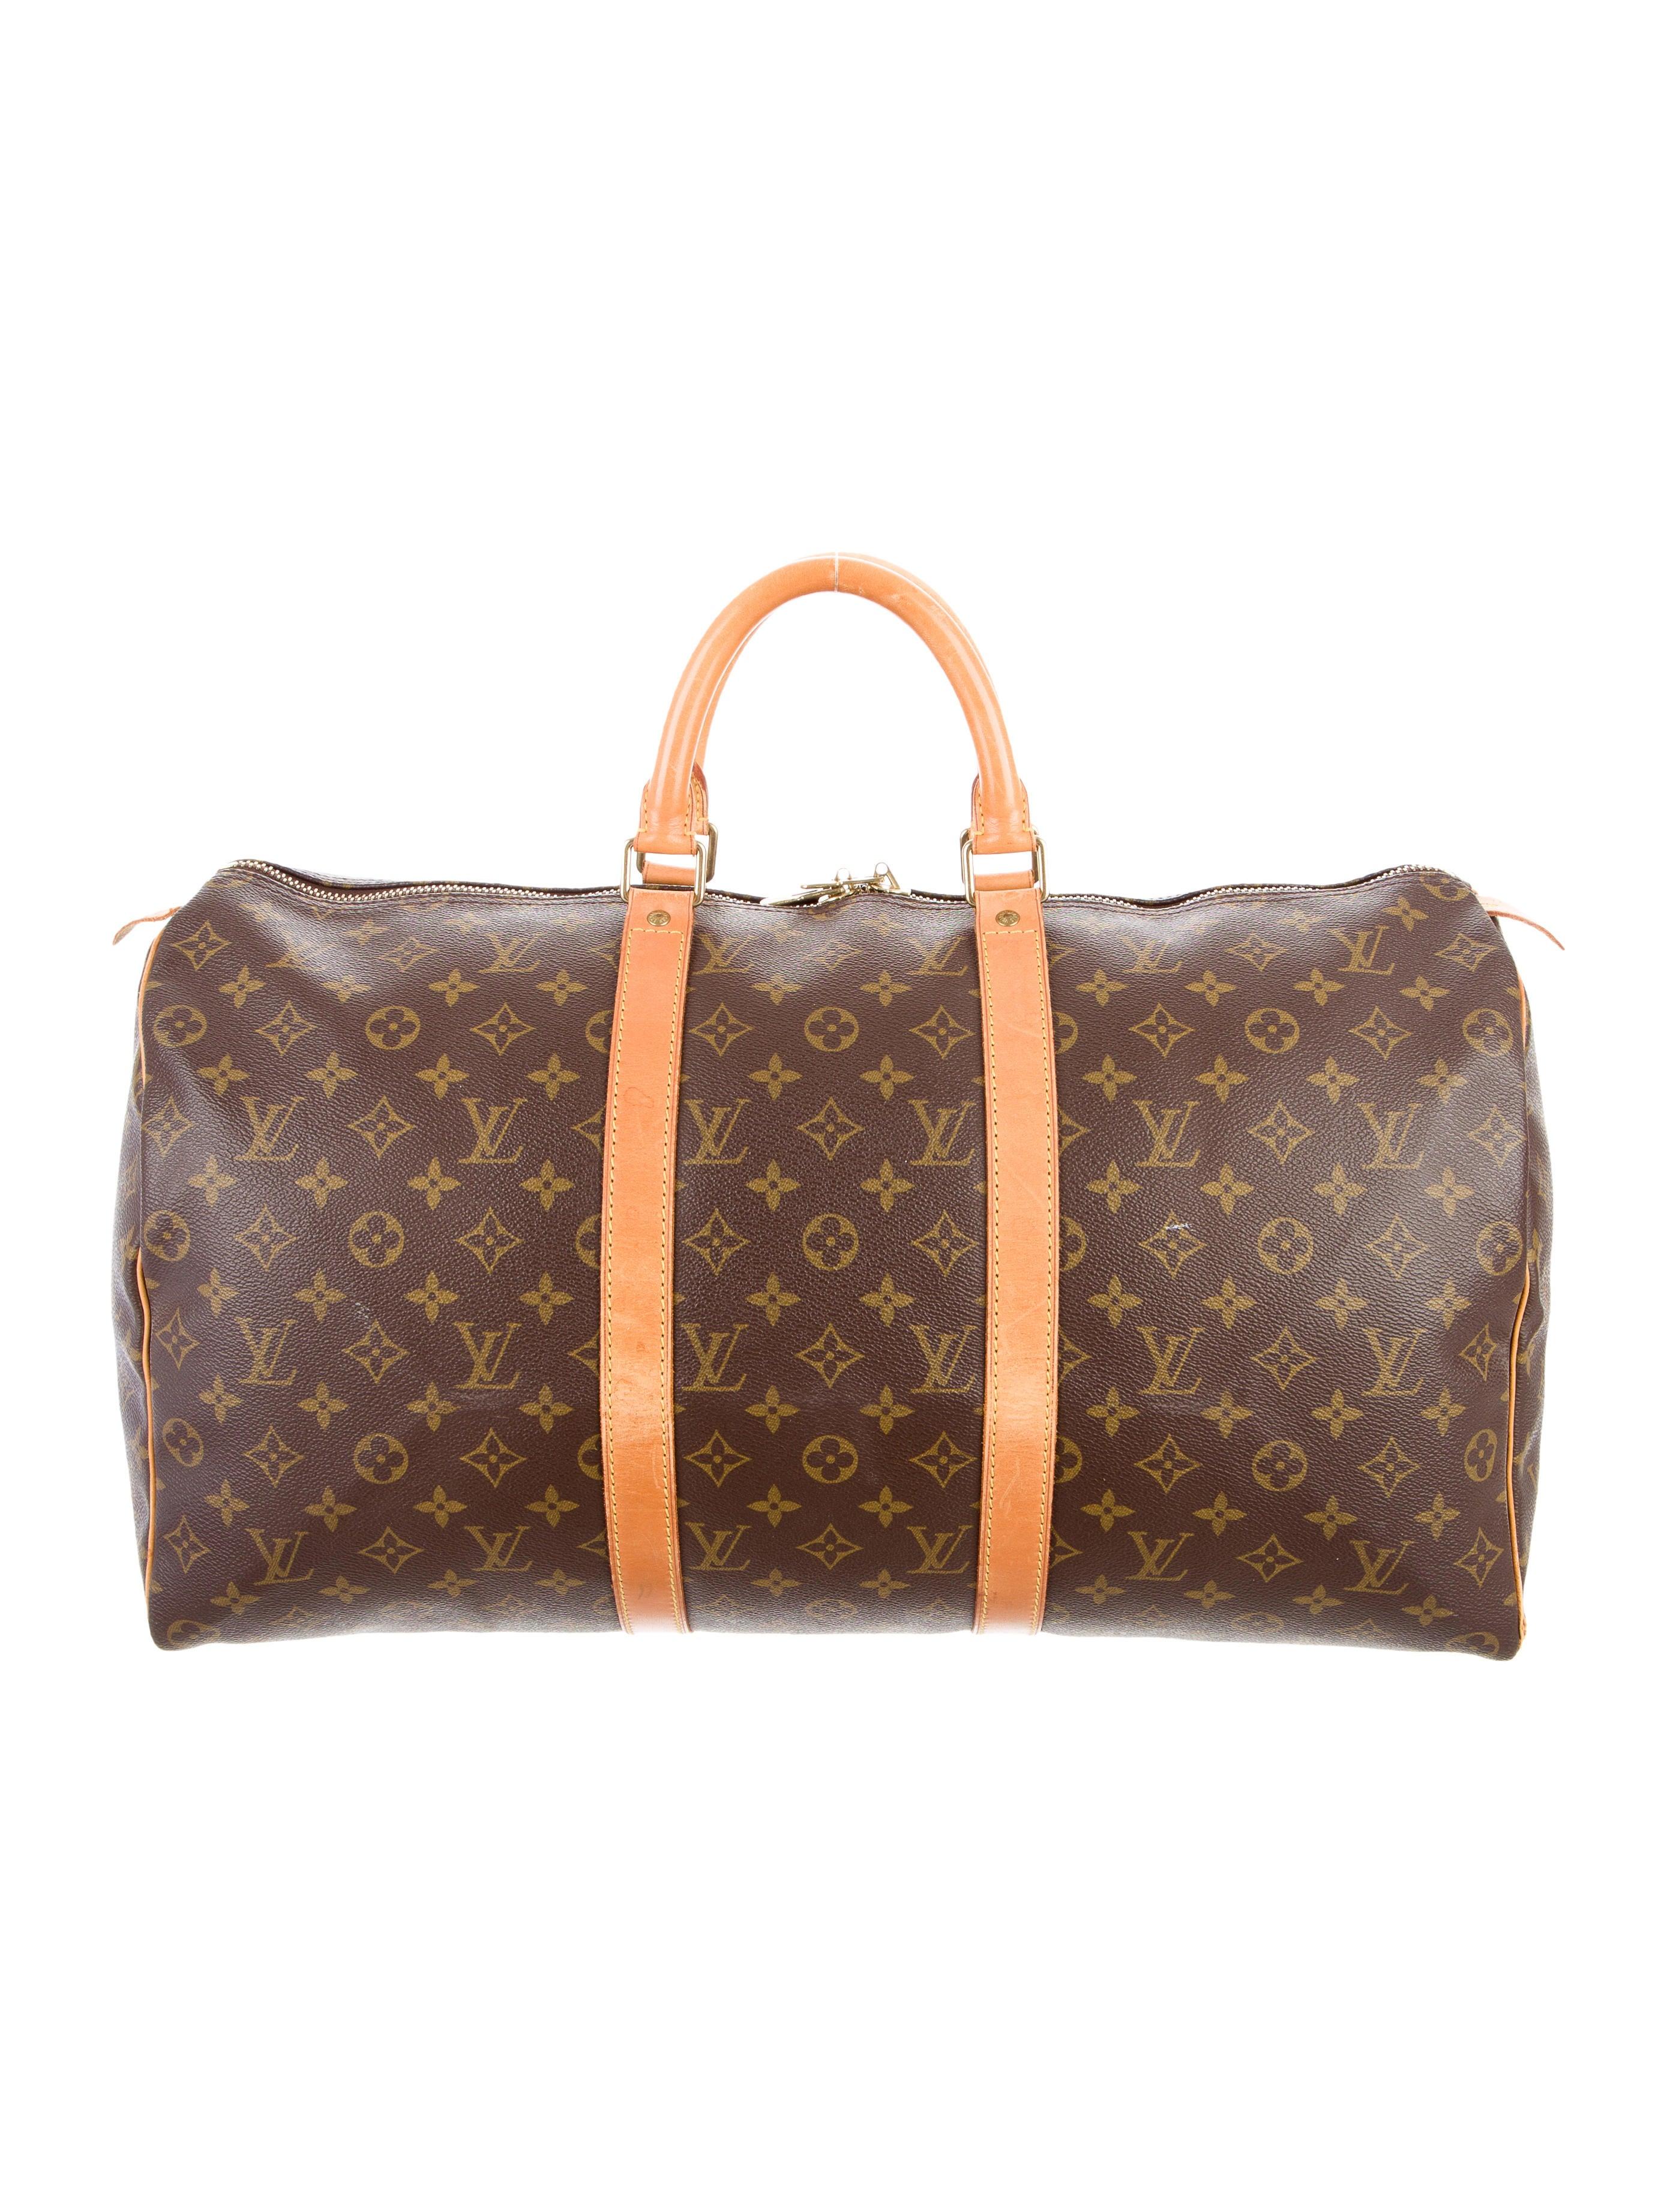 louis vuitton monogram keepall 50 handbags lou110256. Black Bedroom Furniture Sets. Home Design Ideas